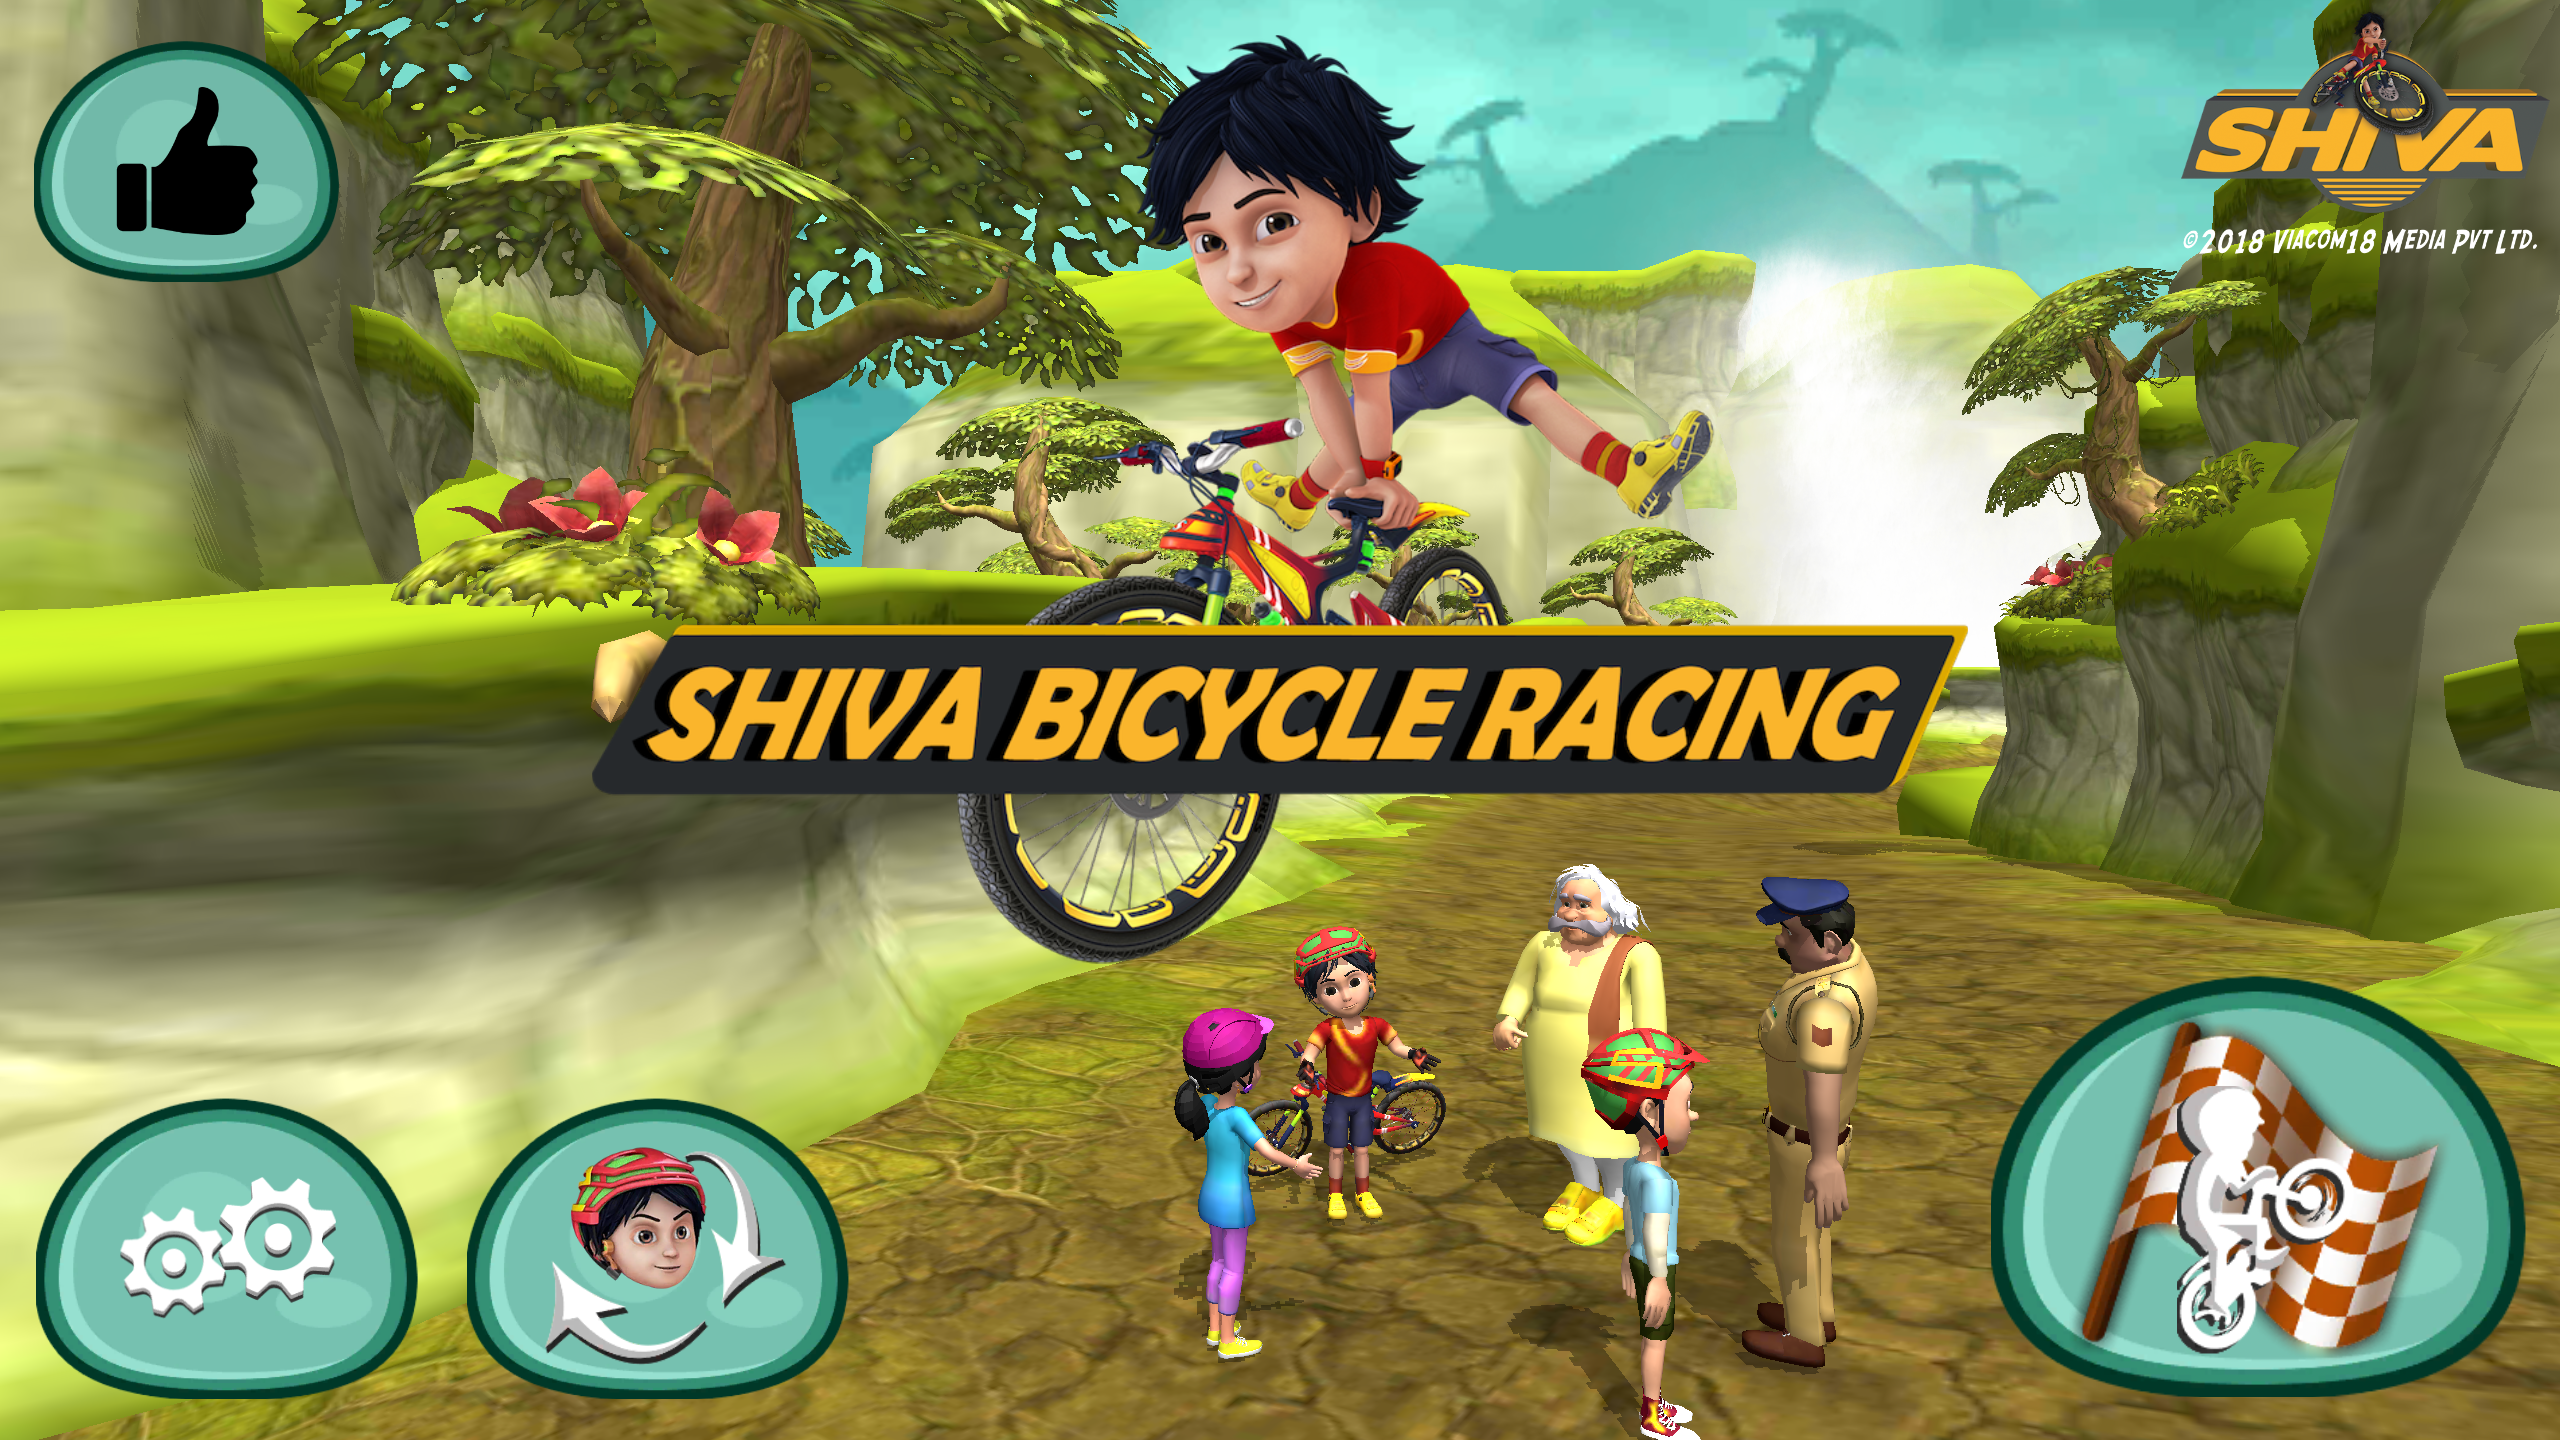 Shiva Bicycle Racing